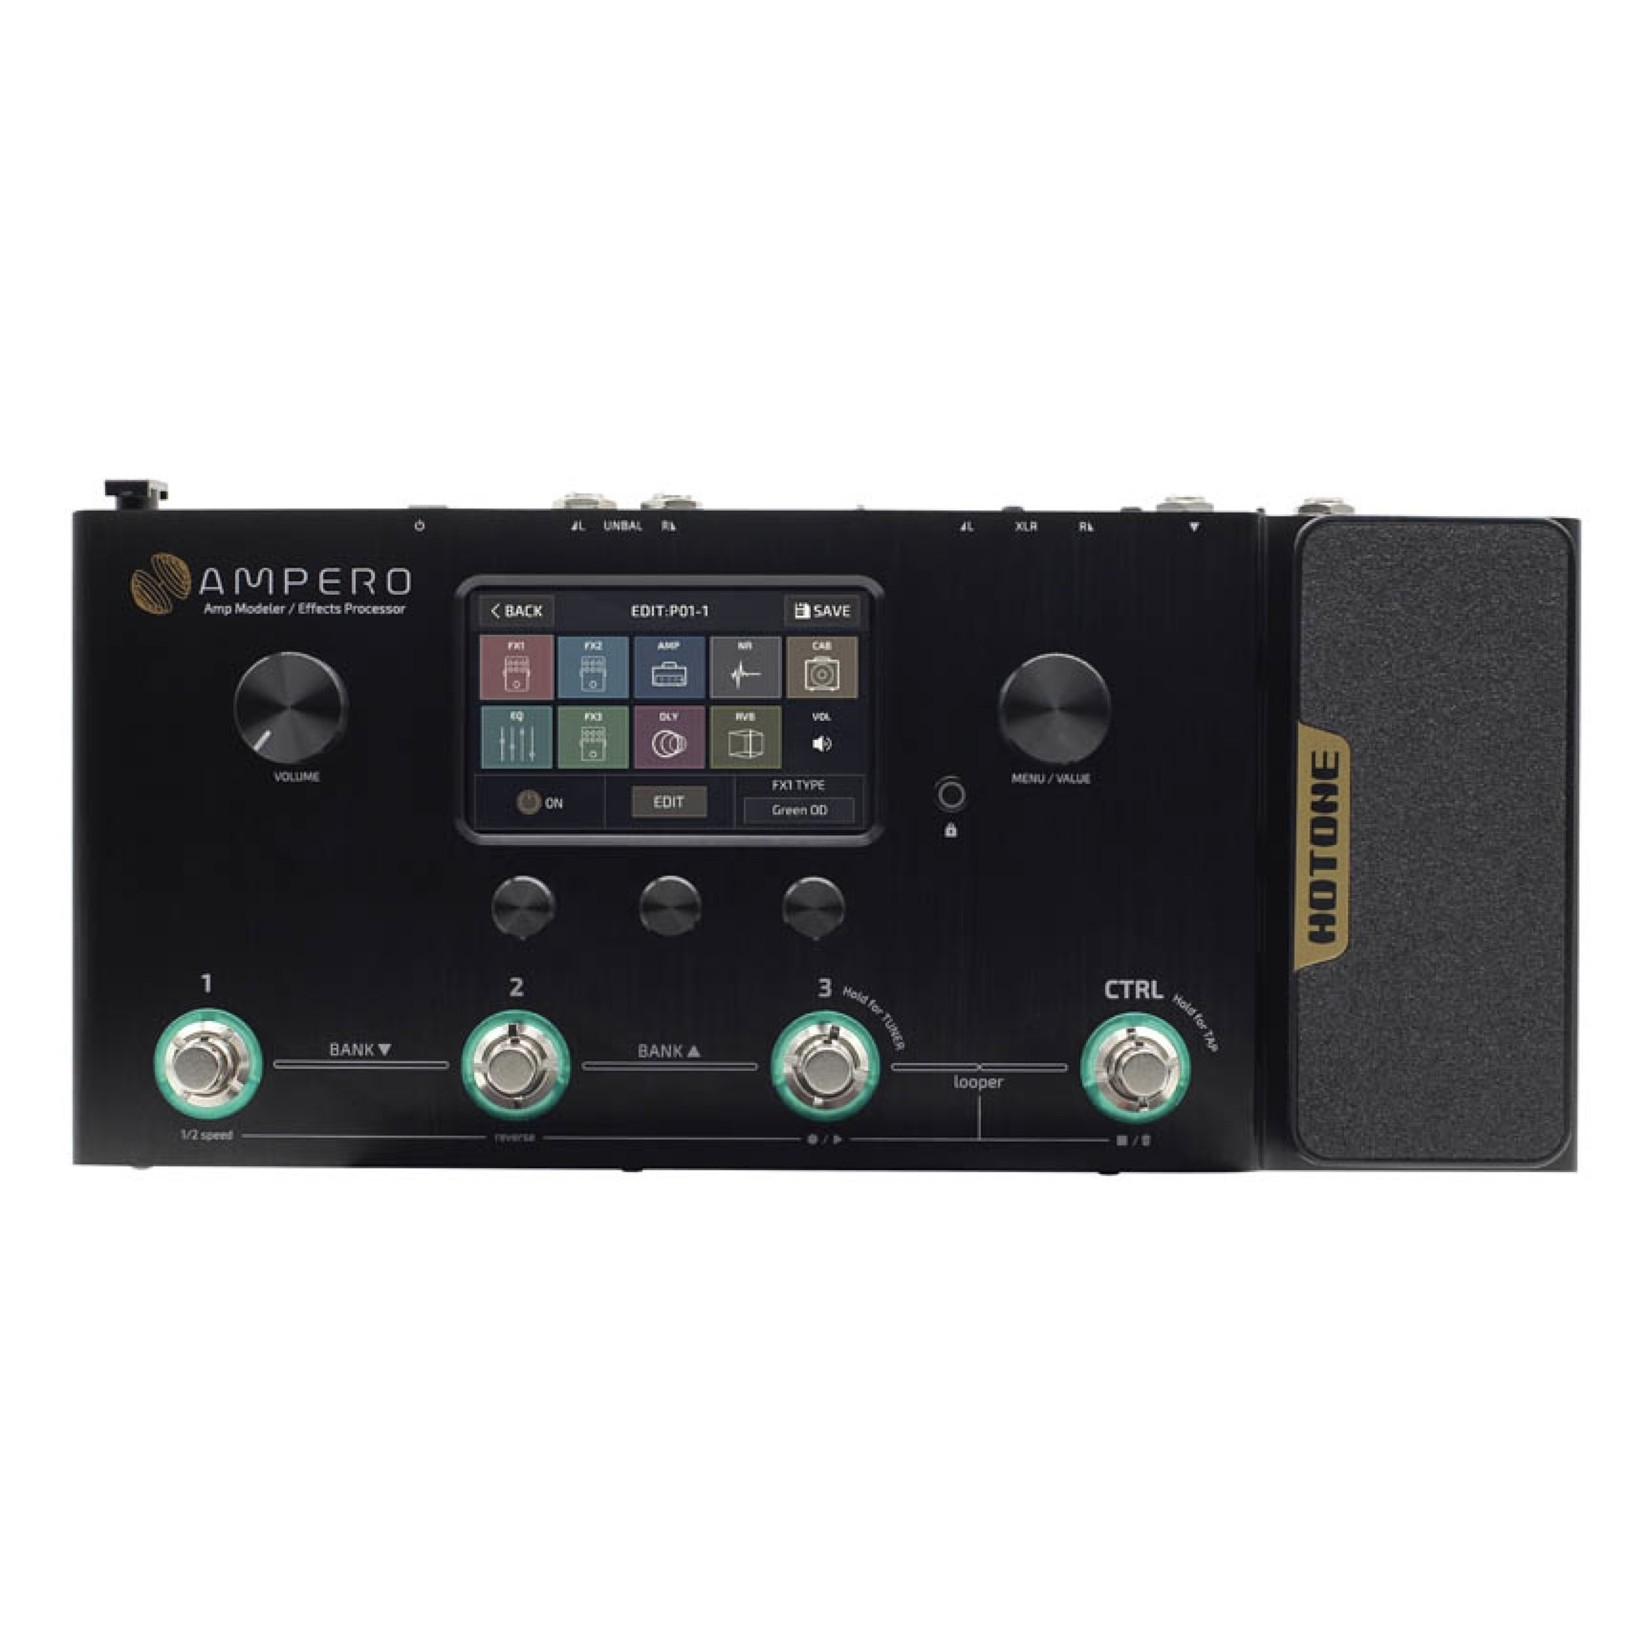 Hotone Hotone Ampero - Amp Modeler / Effects Processor